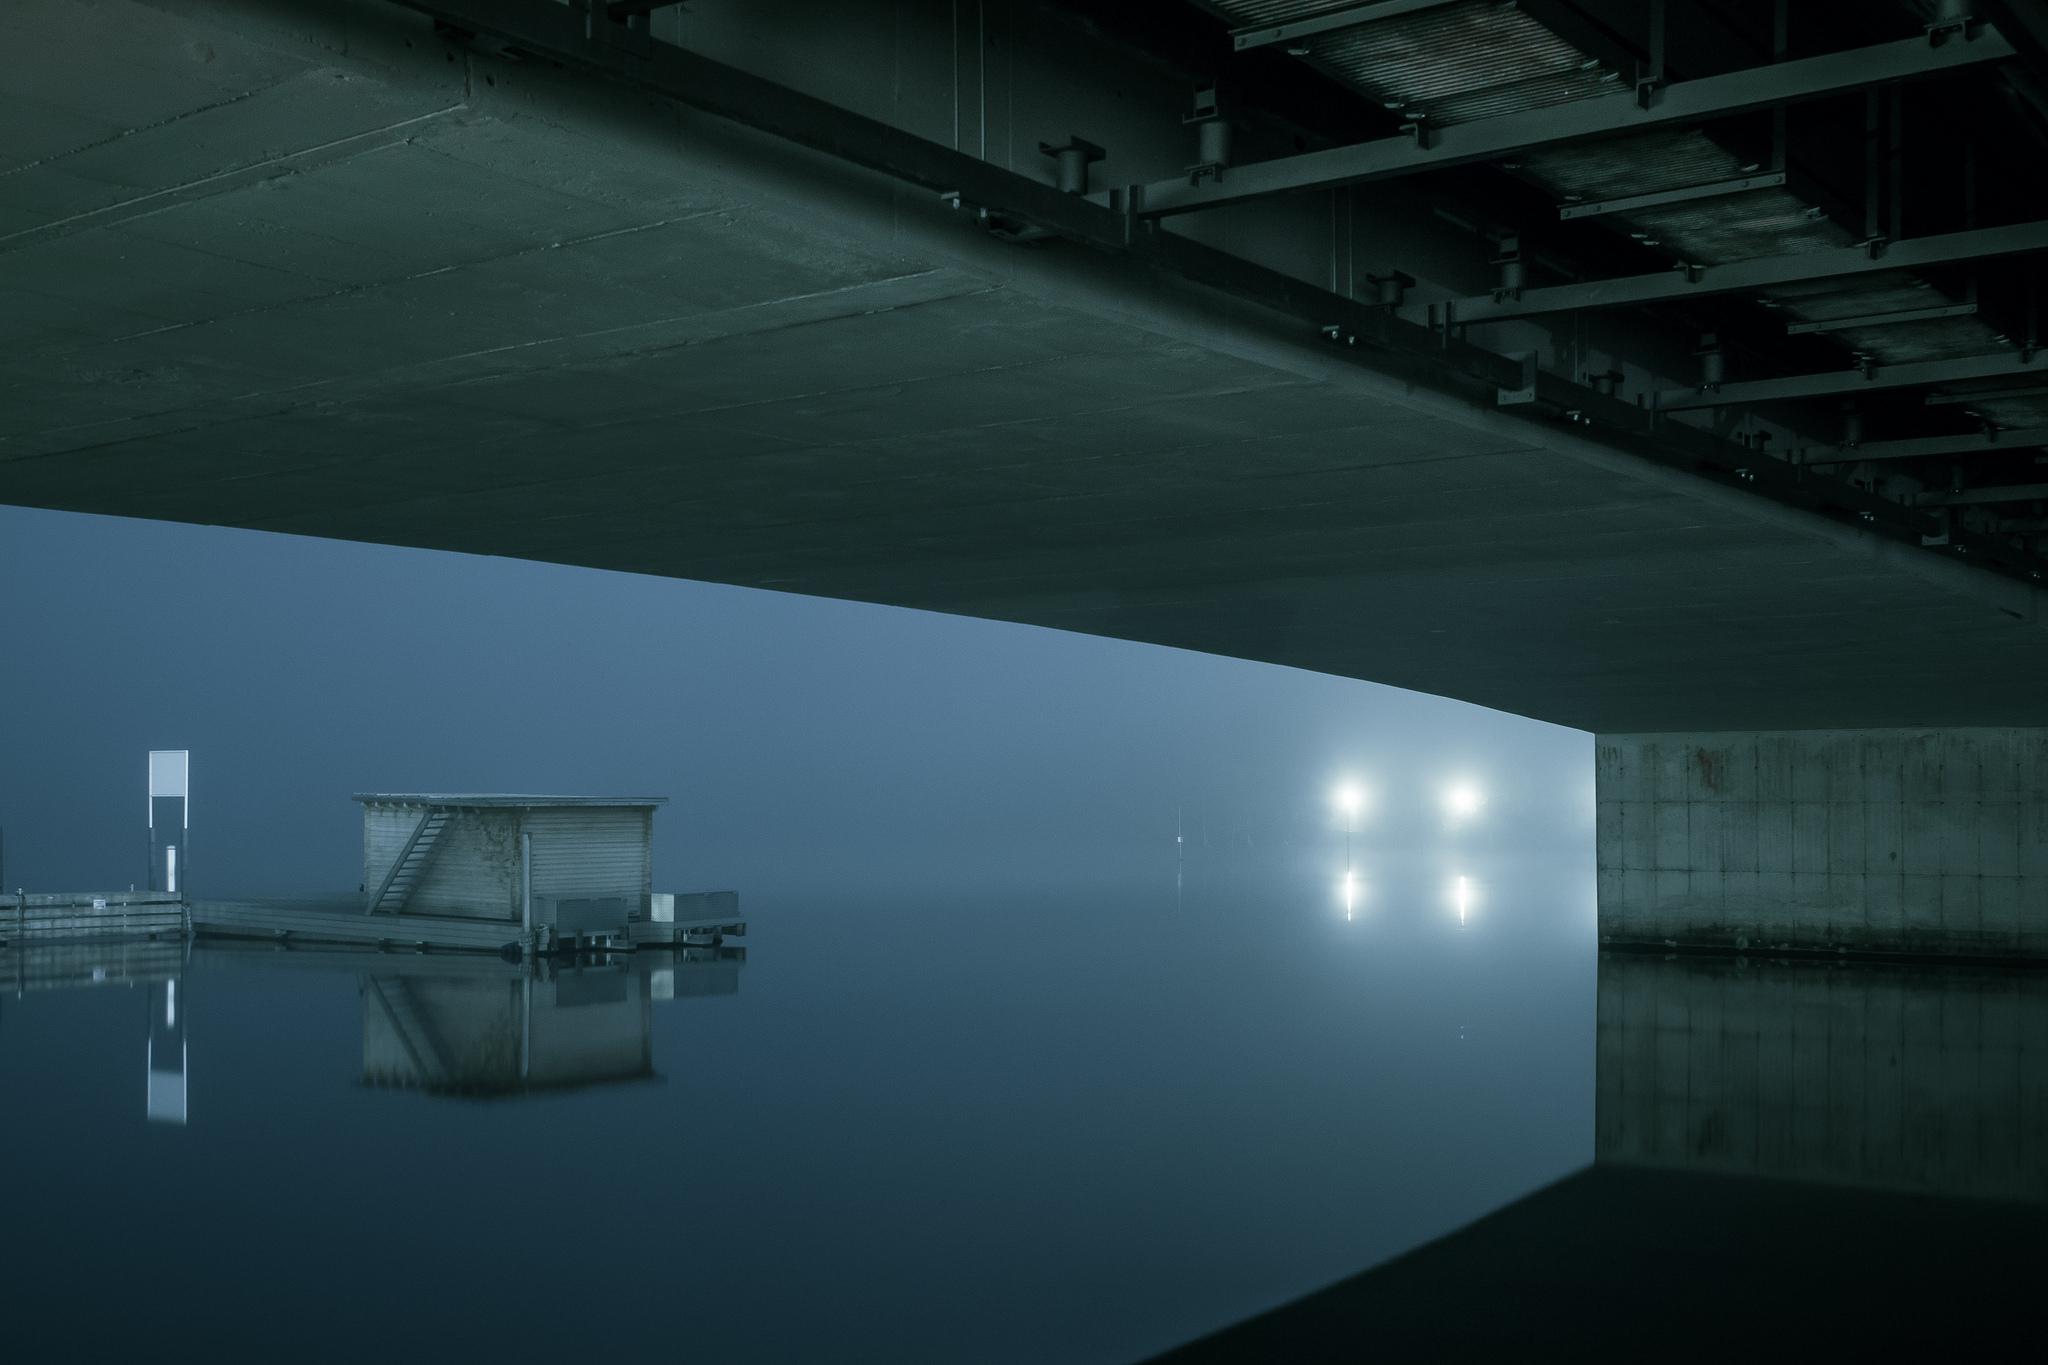 Andreas Levers - At Night Bridge